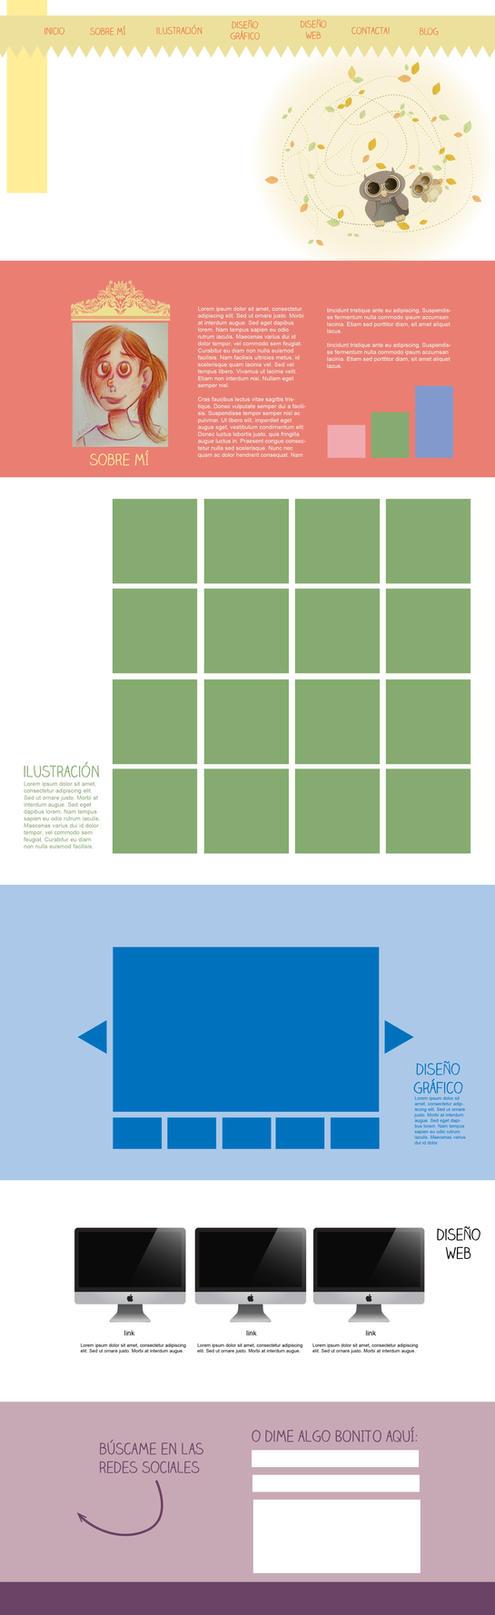 one page web design - la caca mola by Lizeeeee